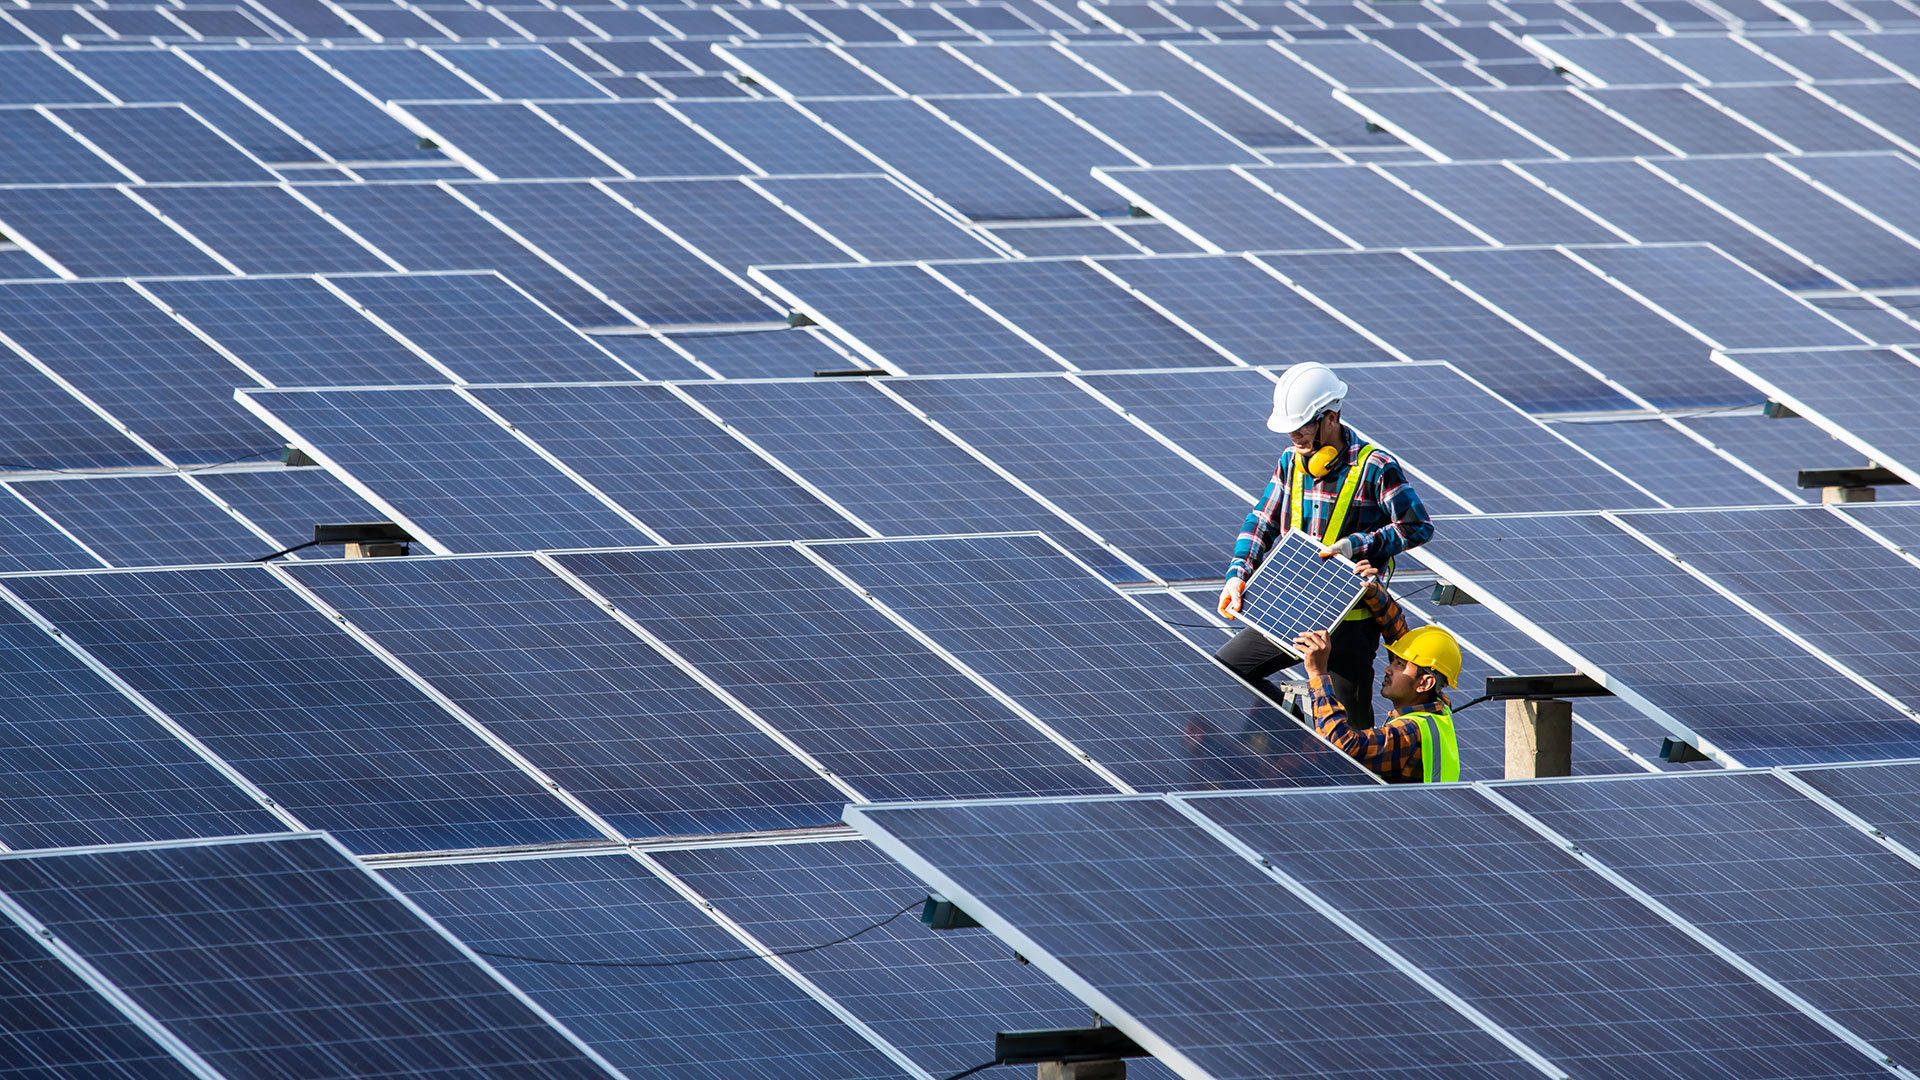 NOVA & NEM GoMEn – NEM 3.0 gives businesses and government bodies a reason to invest in solar energy